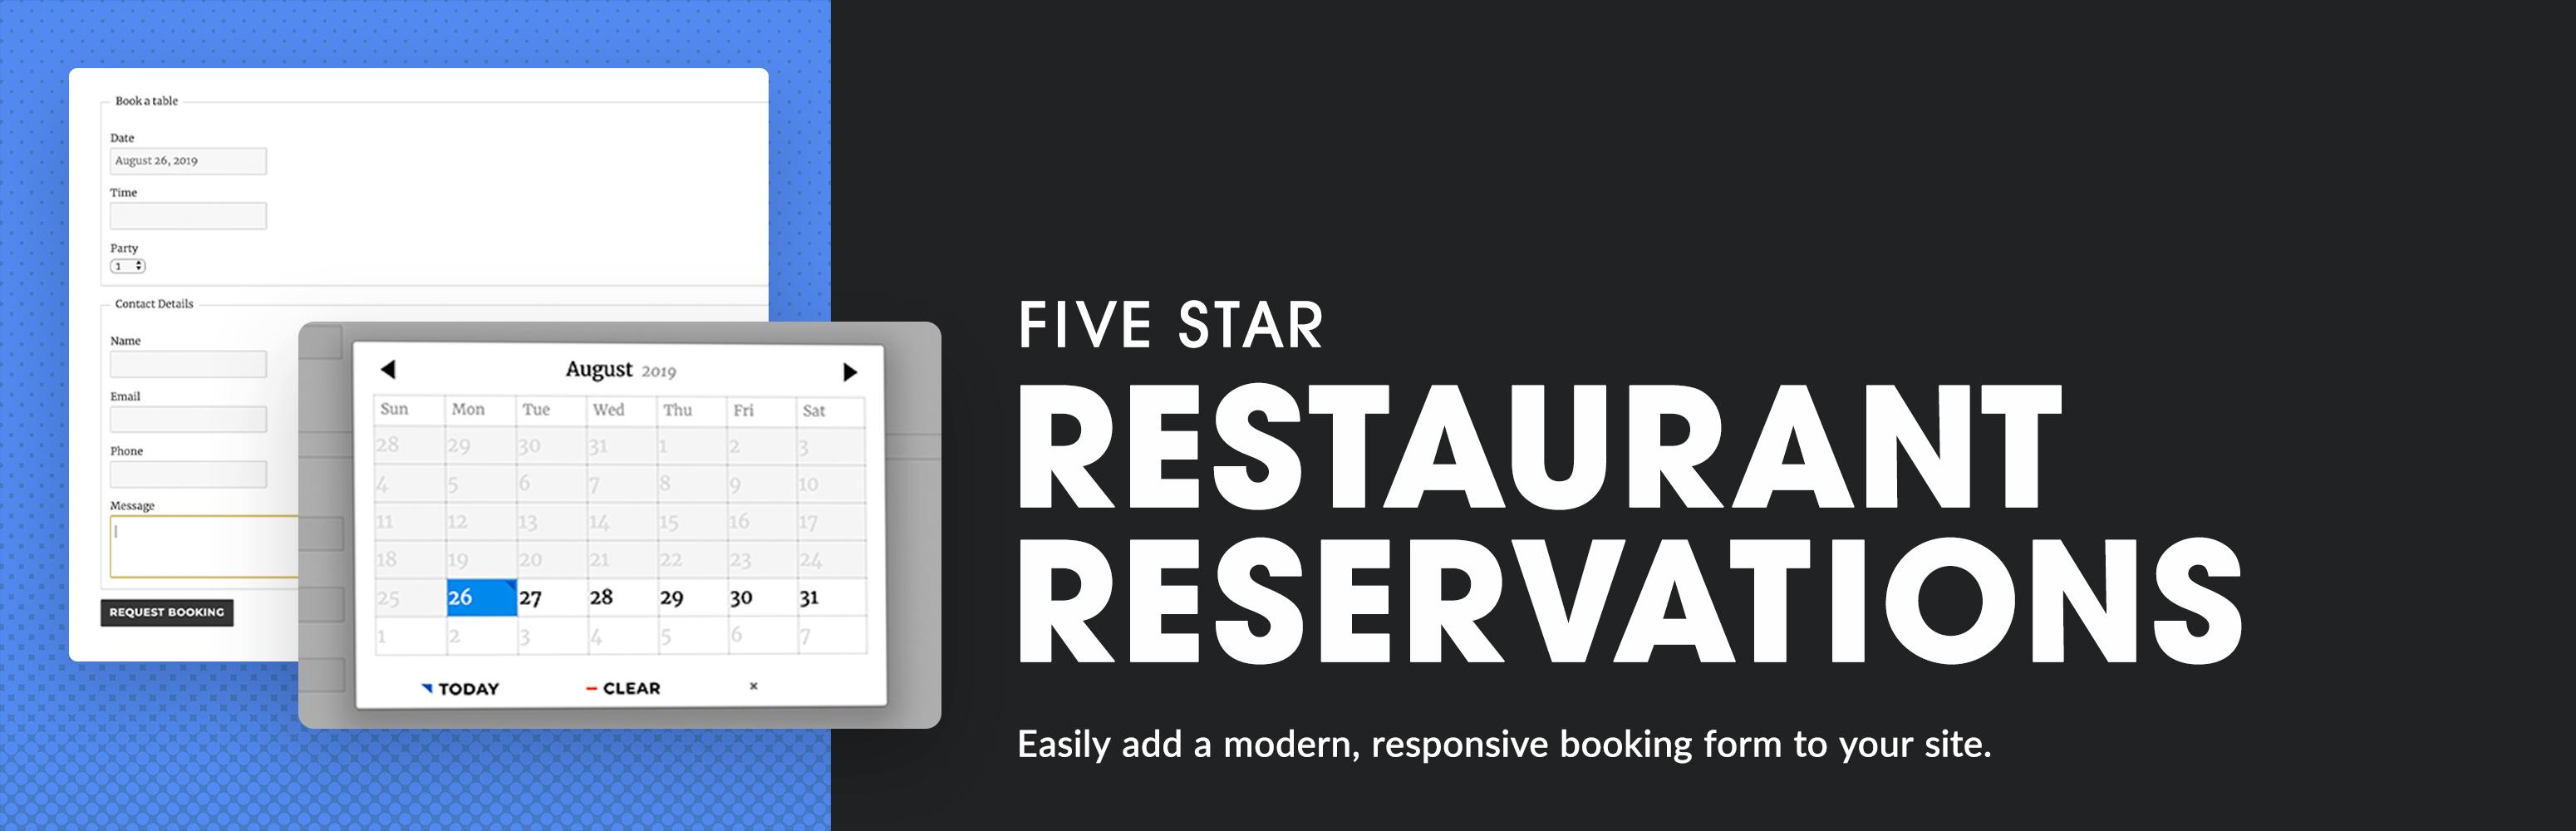 banner-772x250-restaurant-reservations